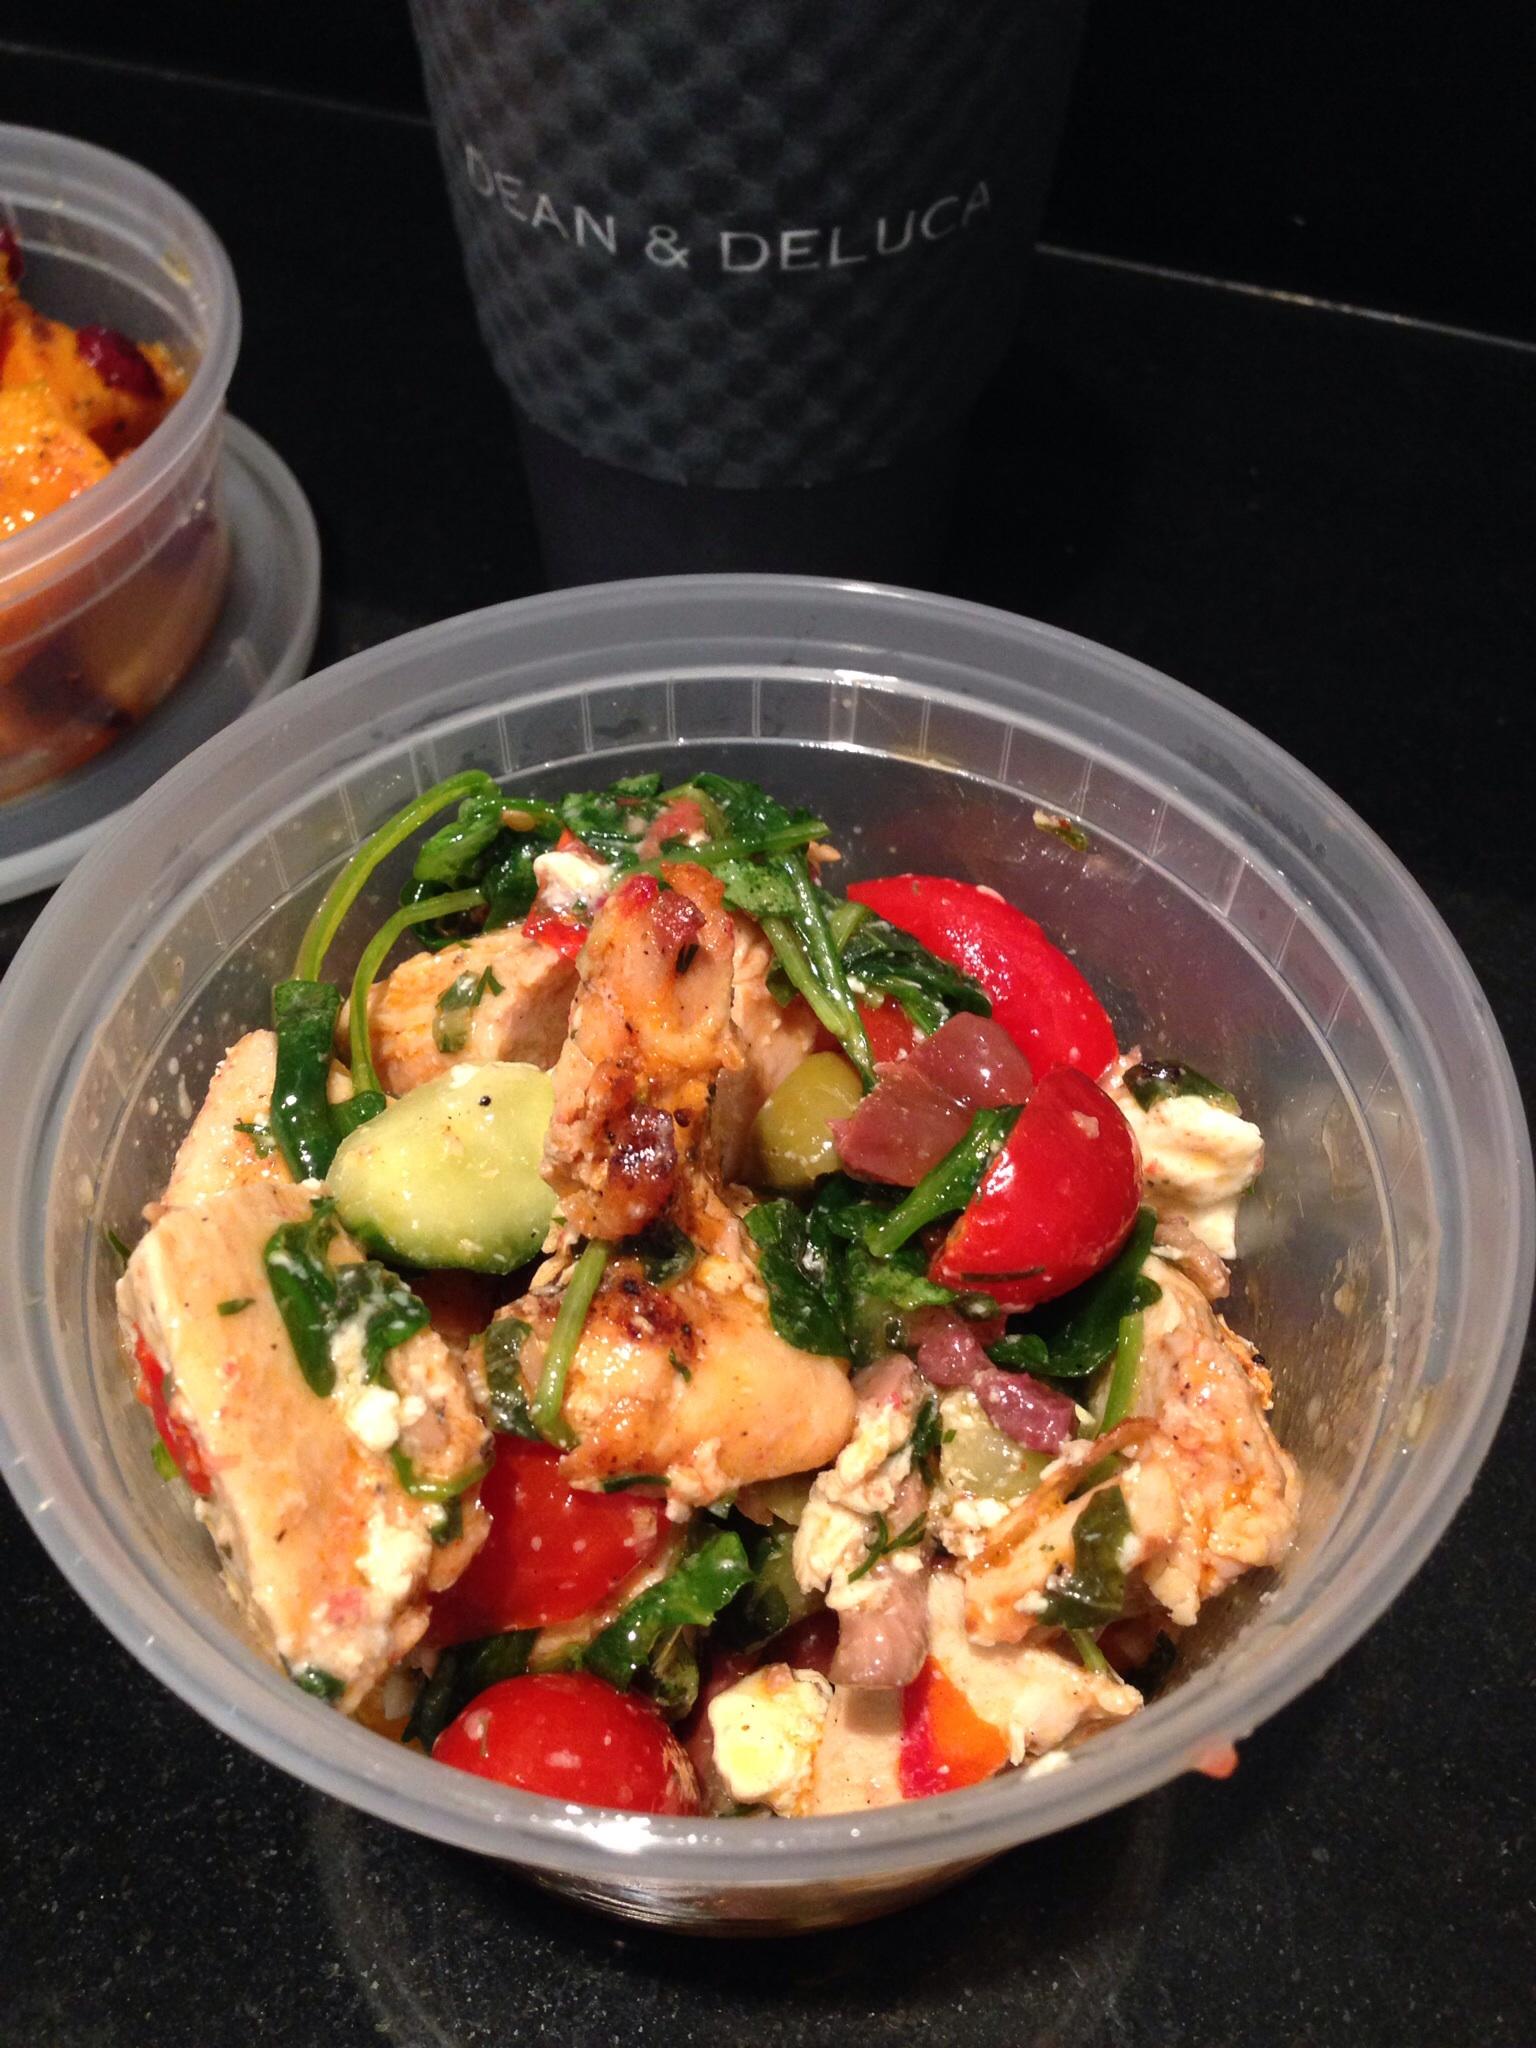 Dean & Deluca Greek Chicken Salad